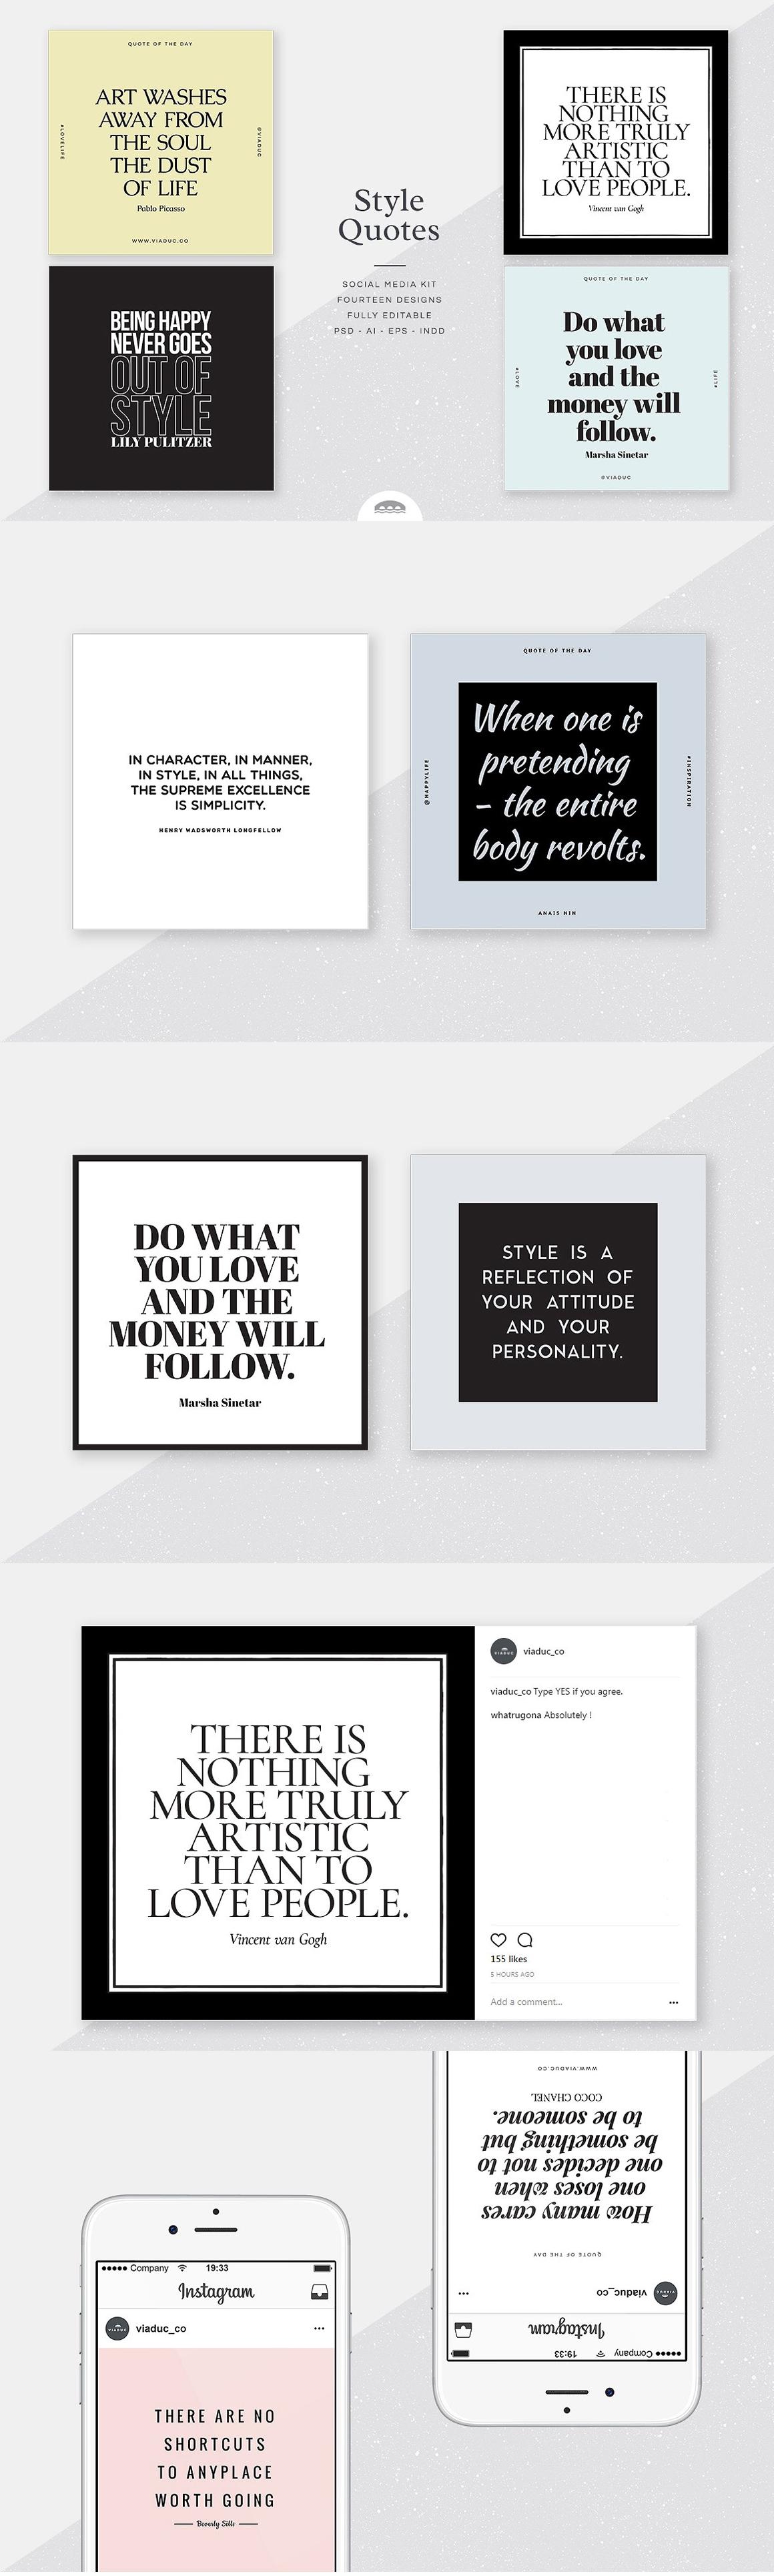 Style Quotes Social Media Kit Templates Psd Eps Social Media